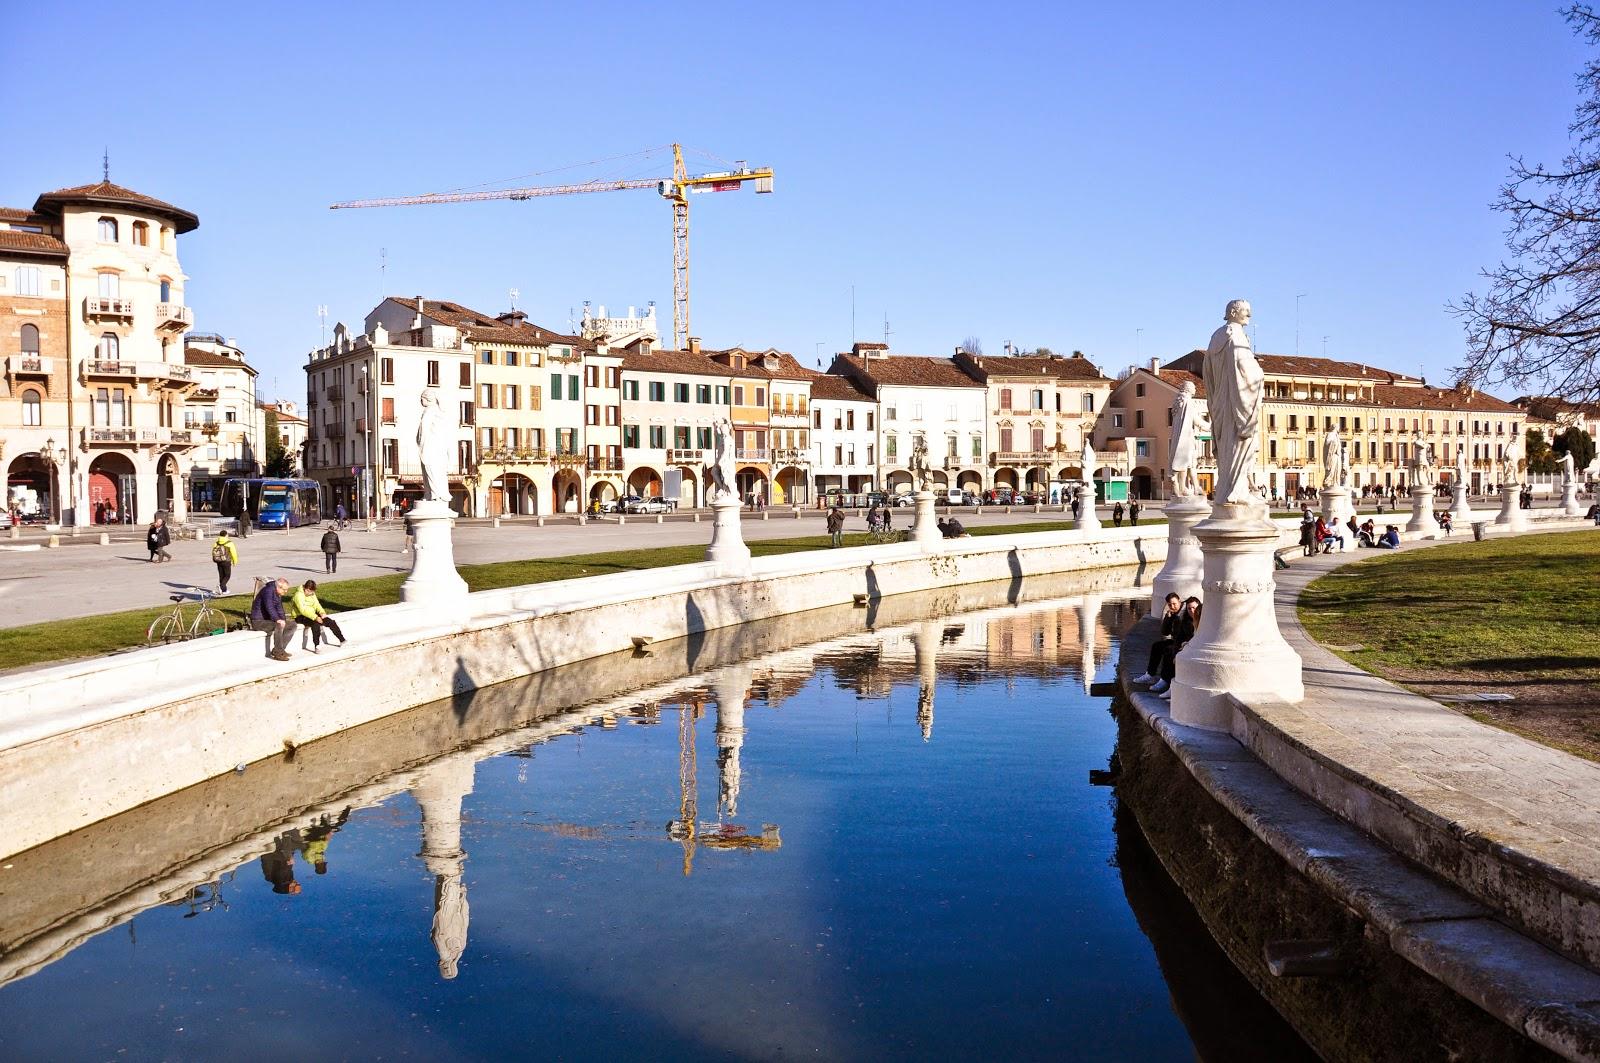 View of Prato della Valle - the biggest square in Italy is in Padua